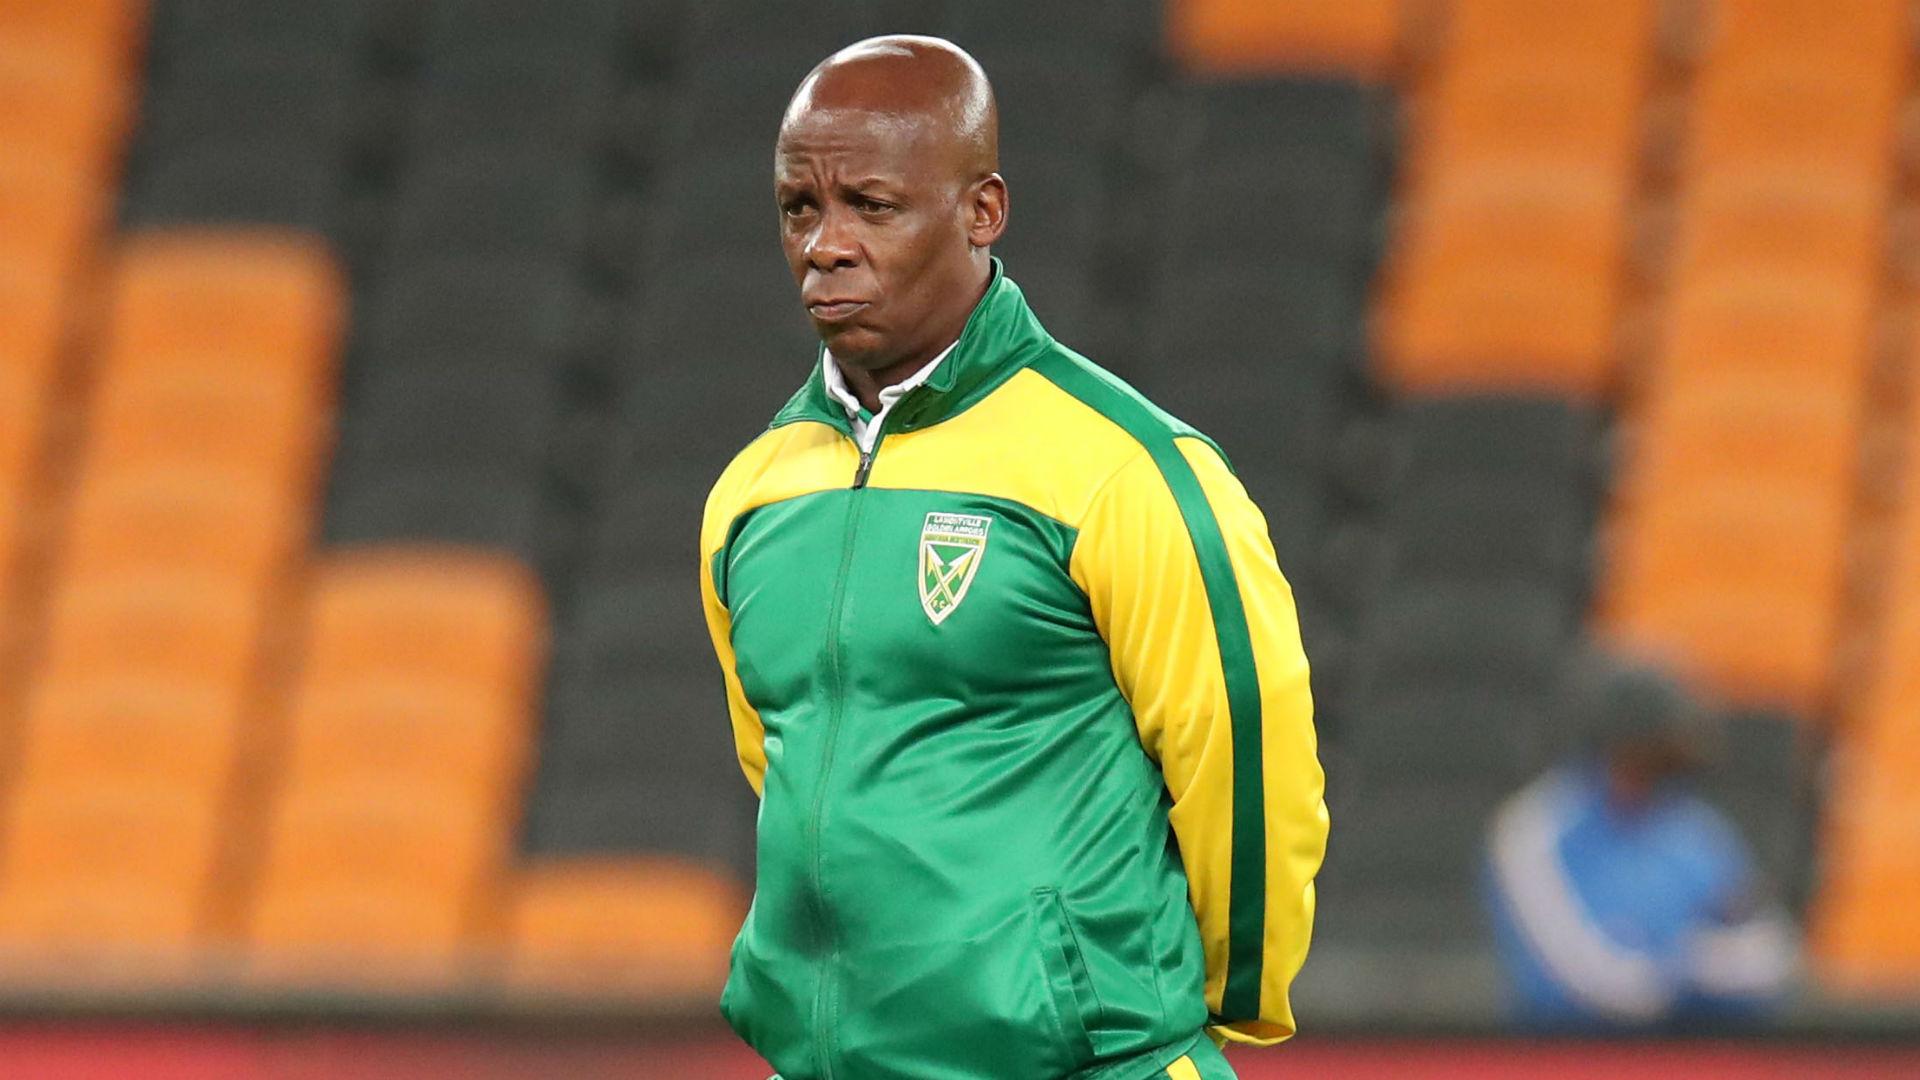 Ncikazi replaces ex-Kaizer Chiefs mentor Komphela as new Golden Arrows coach